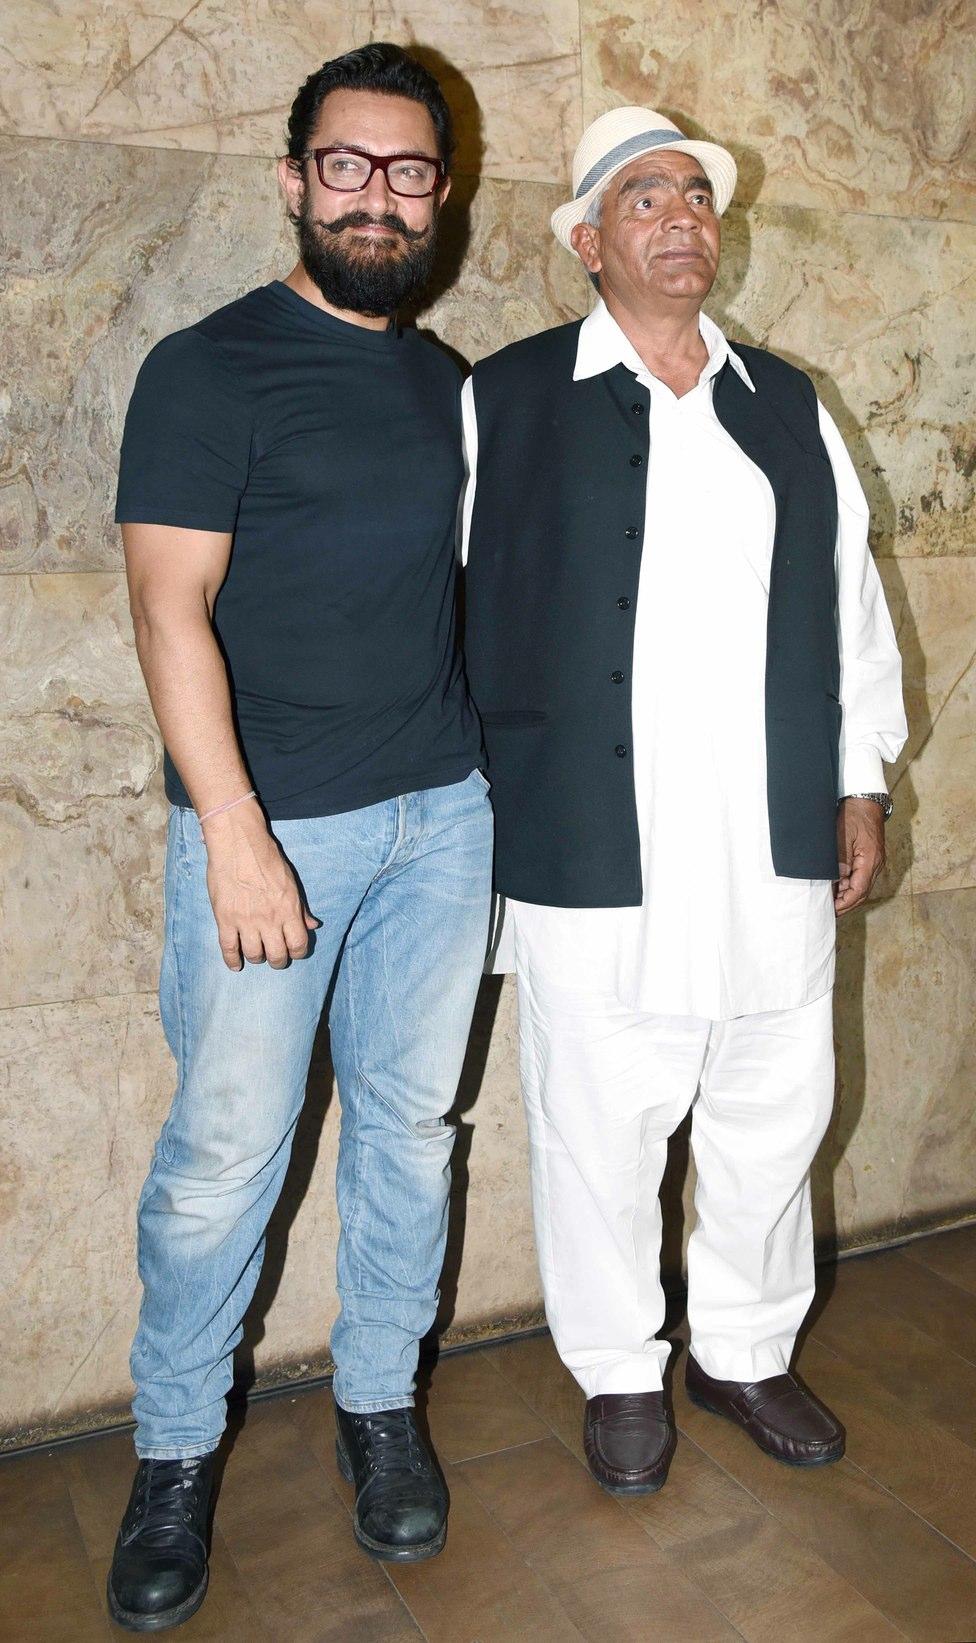 aamir khan and mahavir singh phogat